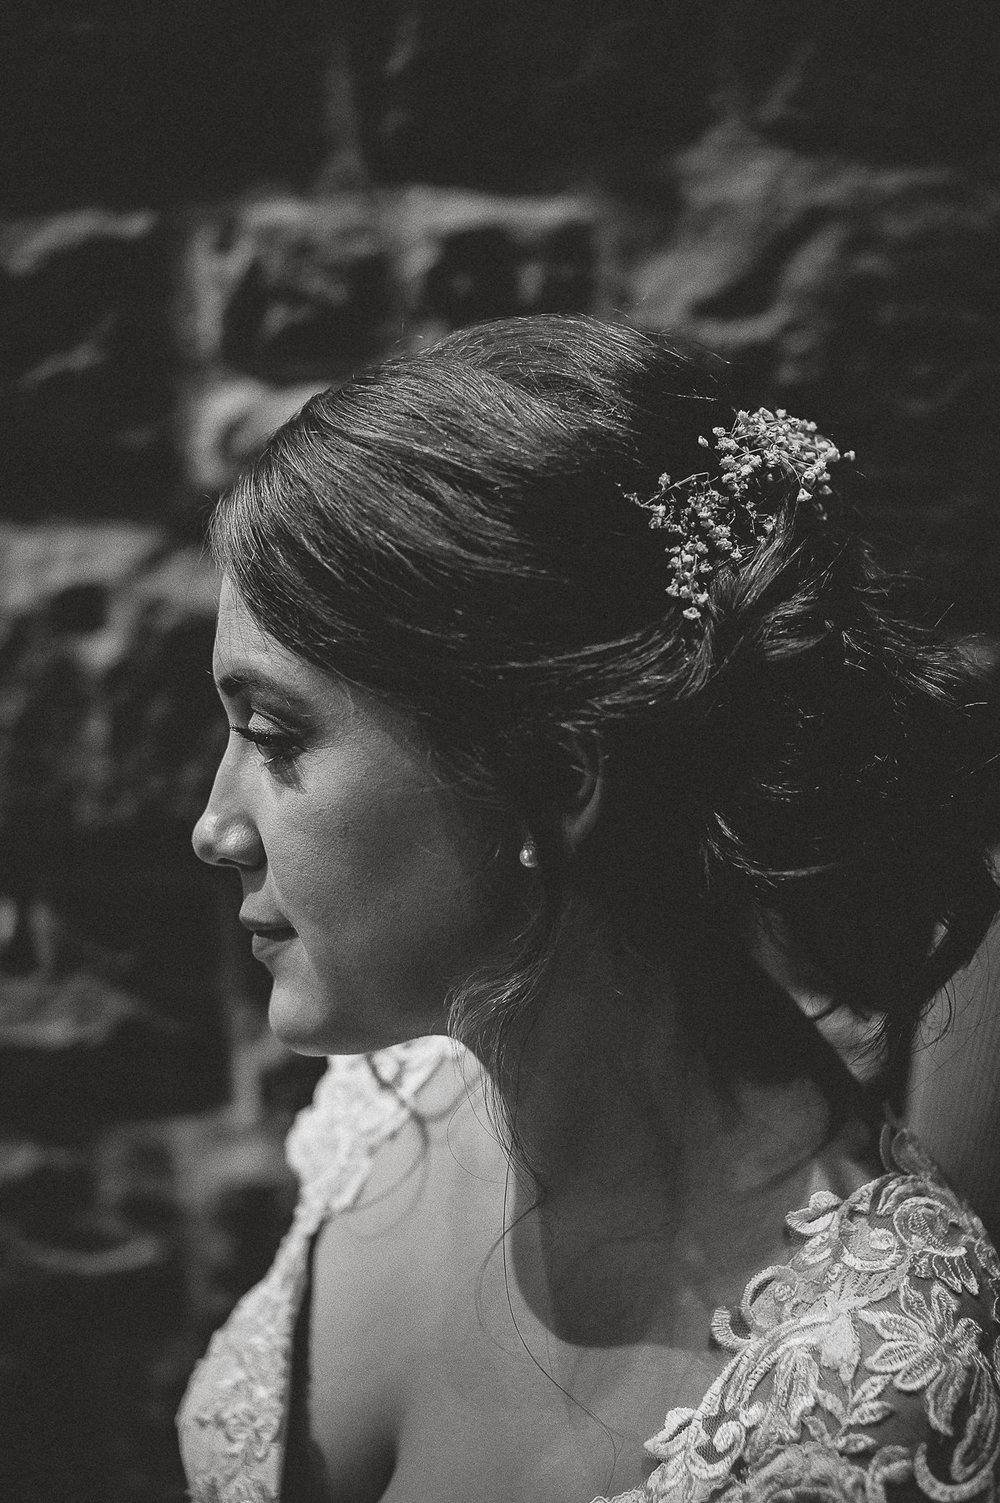 breighton-and-basette-photography-copyrighted-image-blog-amanda-and-eric-wedding-089.jpg